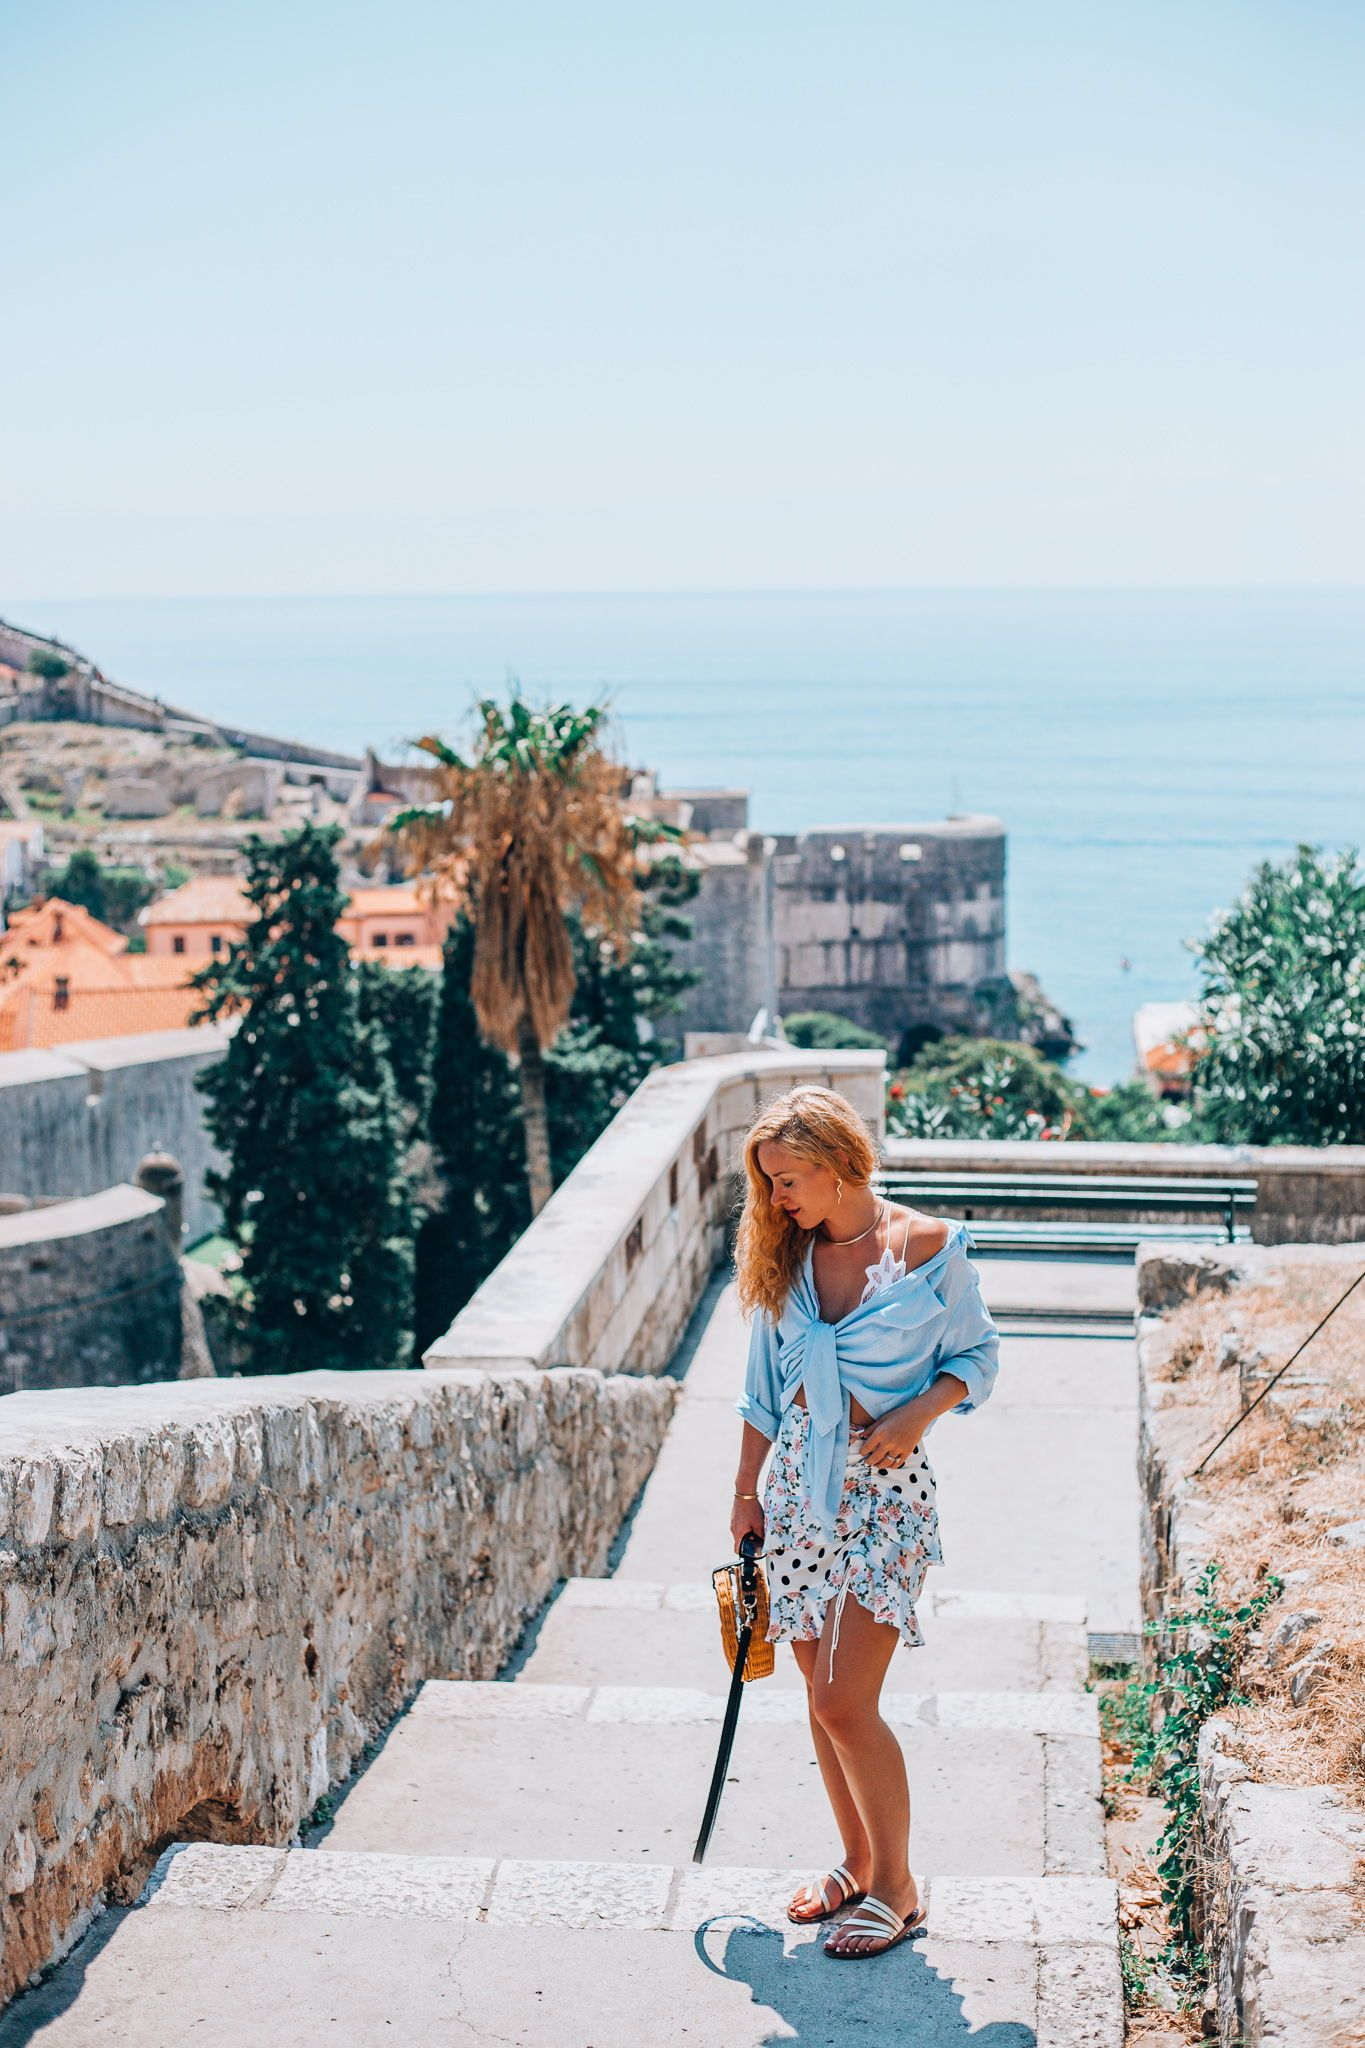 One Week in Dubrovnik, Croatia Croatia, Dubrovnik